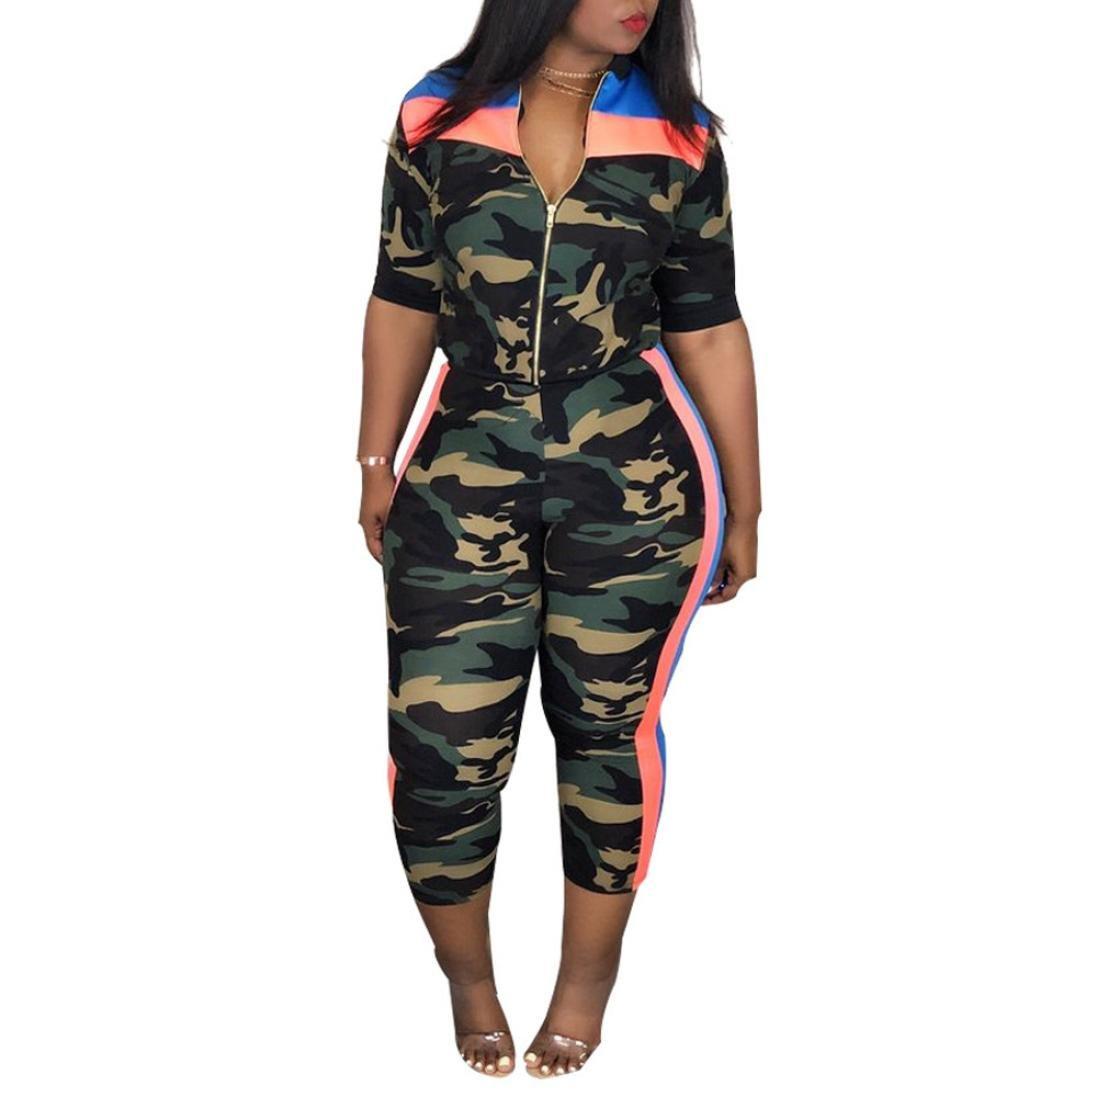 Orangeskycn Sweatshirt For Women Zipper Camouflage Stripe Tops Loose Coat Long Pants